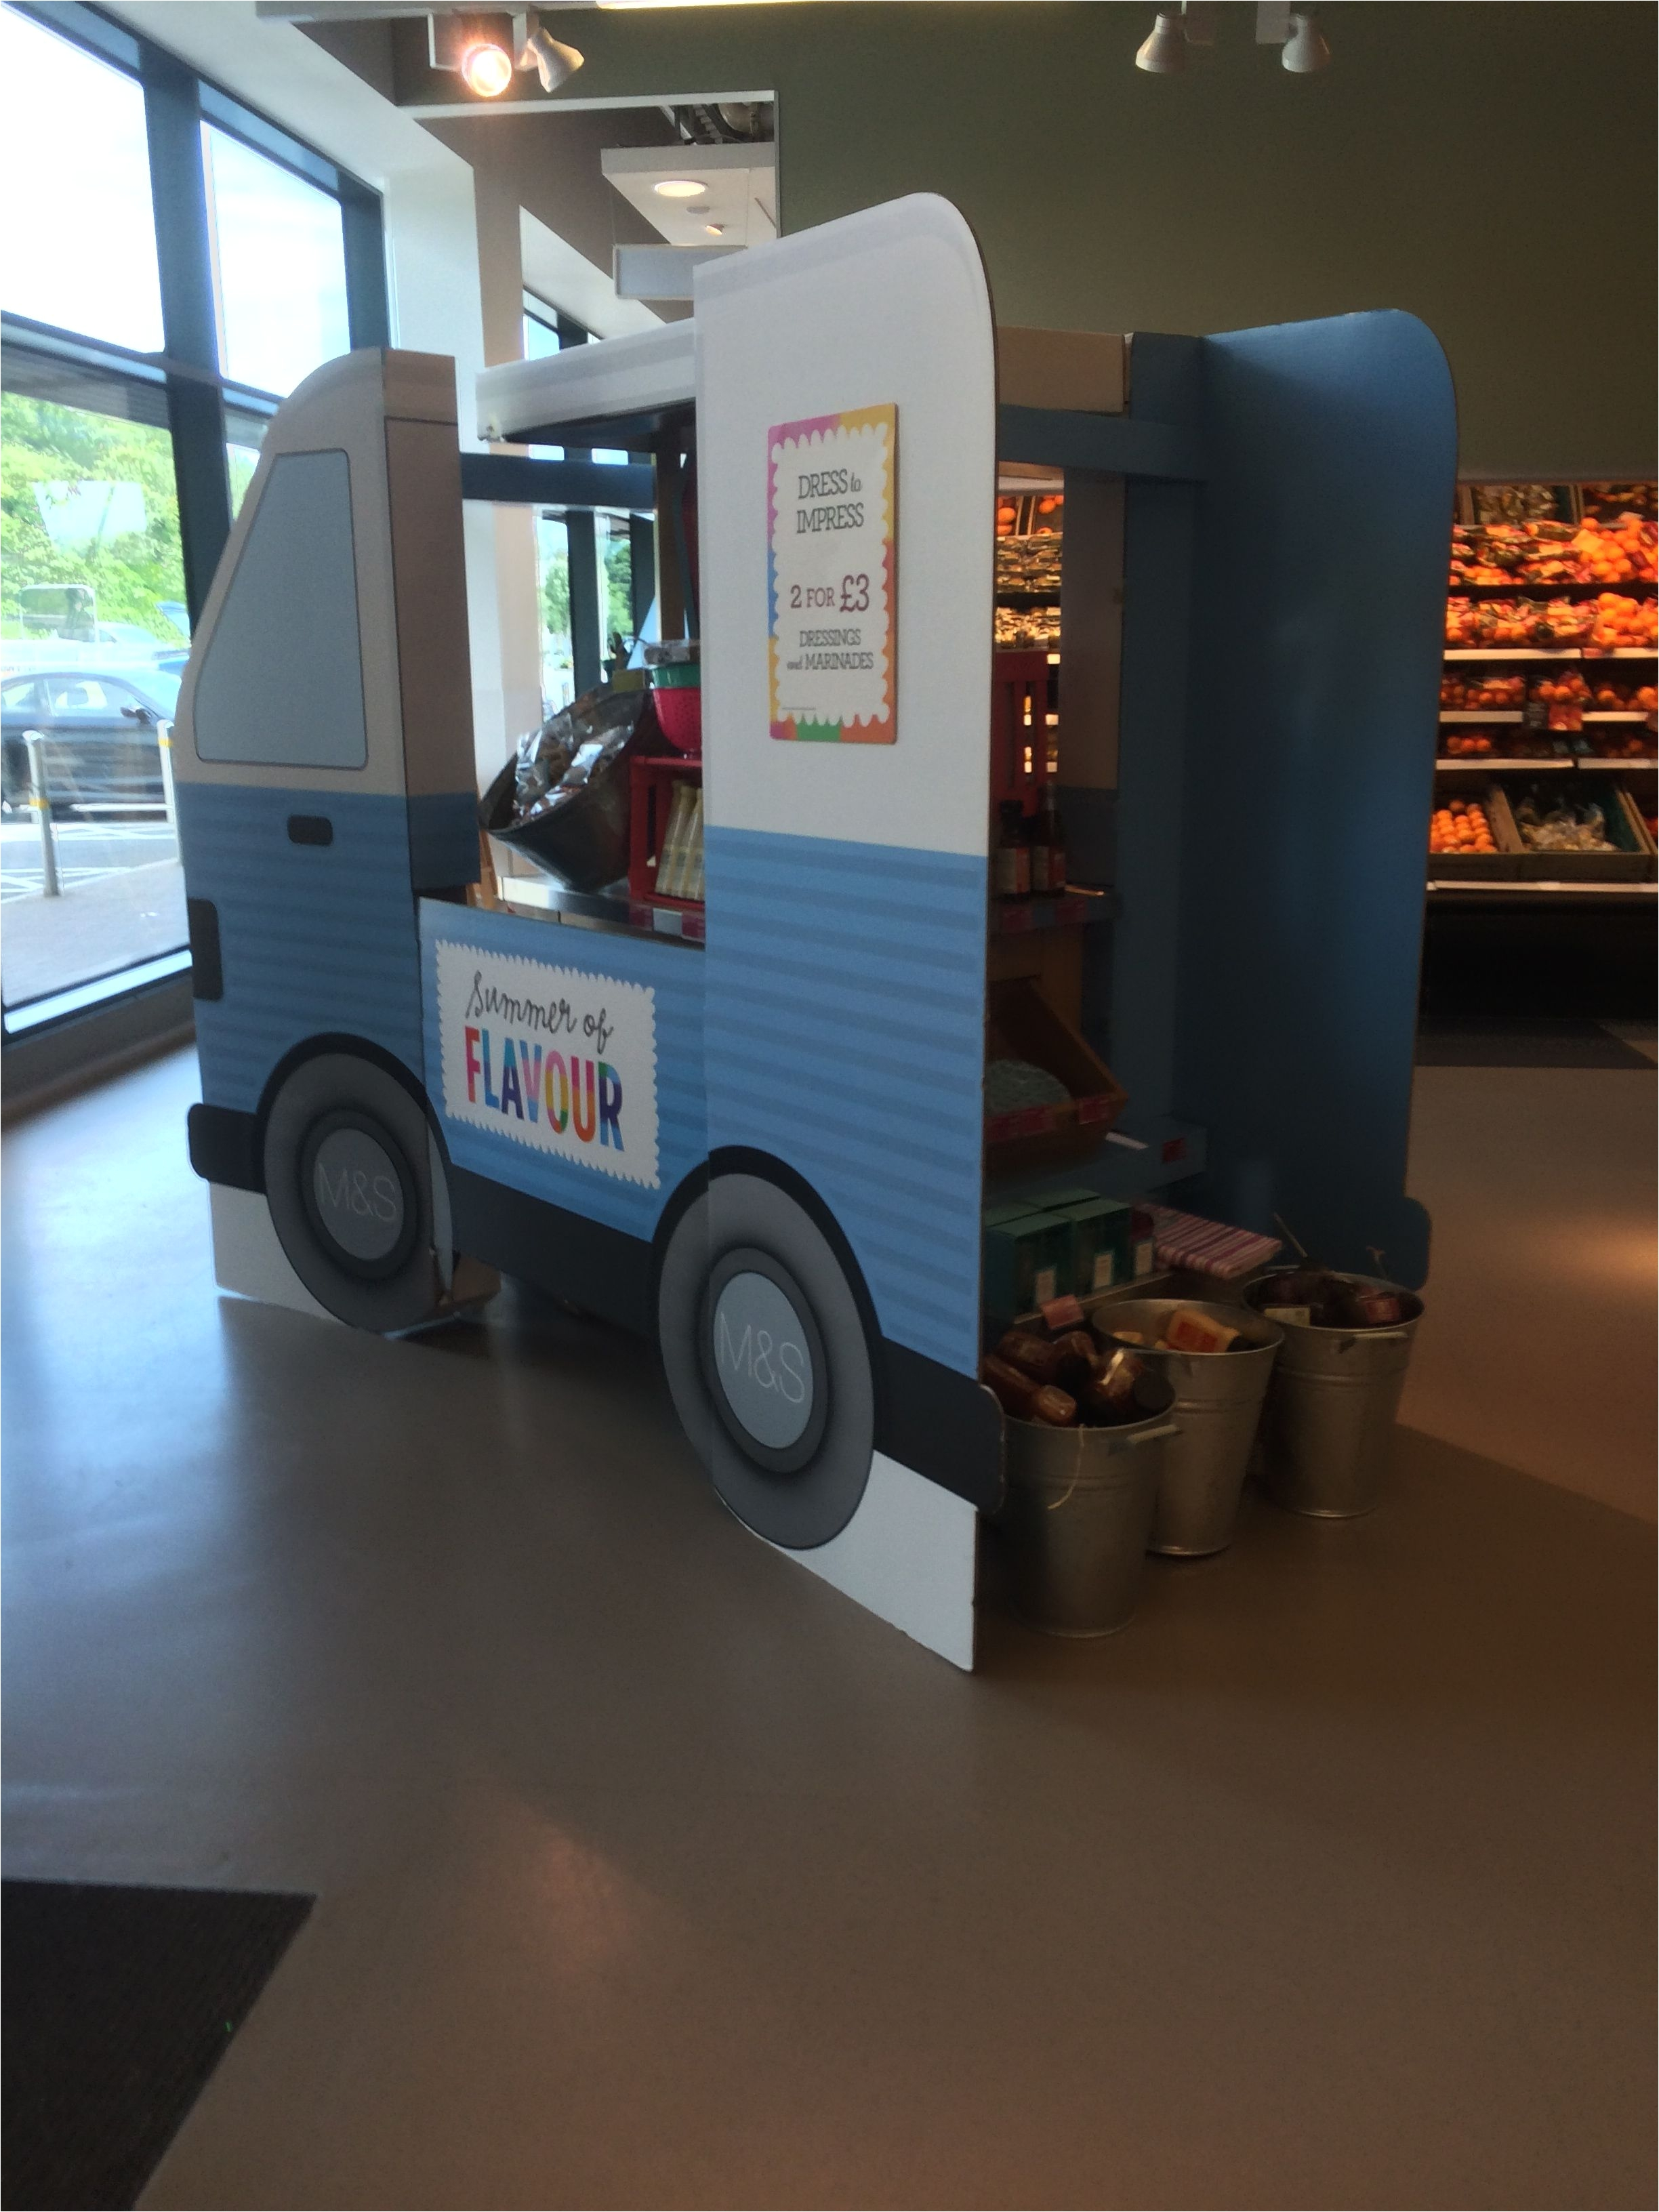 m s shoreham foodhall food supermarket layout landscape customer journey